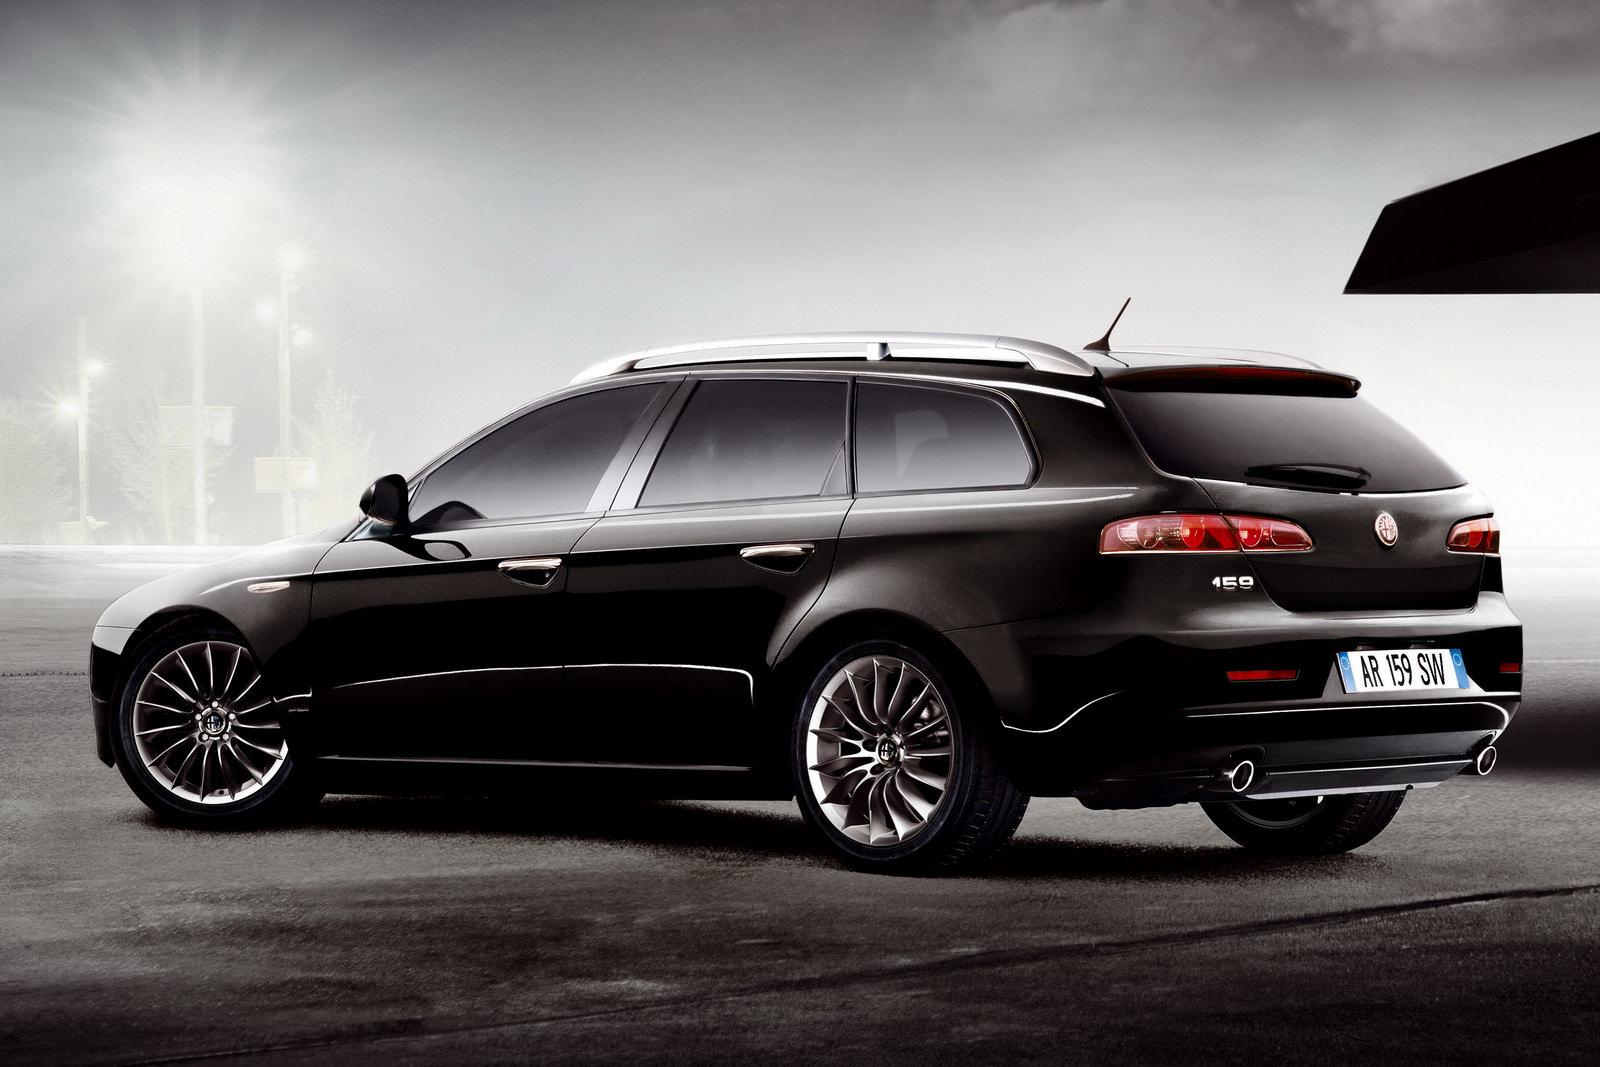 alfa romeo debuts 2011my 159 sedan and sportwagon. Black Bedroom Furniture Sets. Home Design Ideas